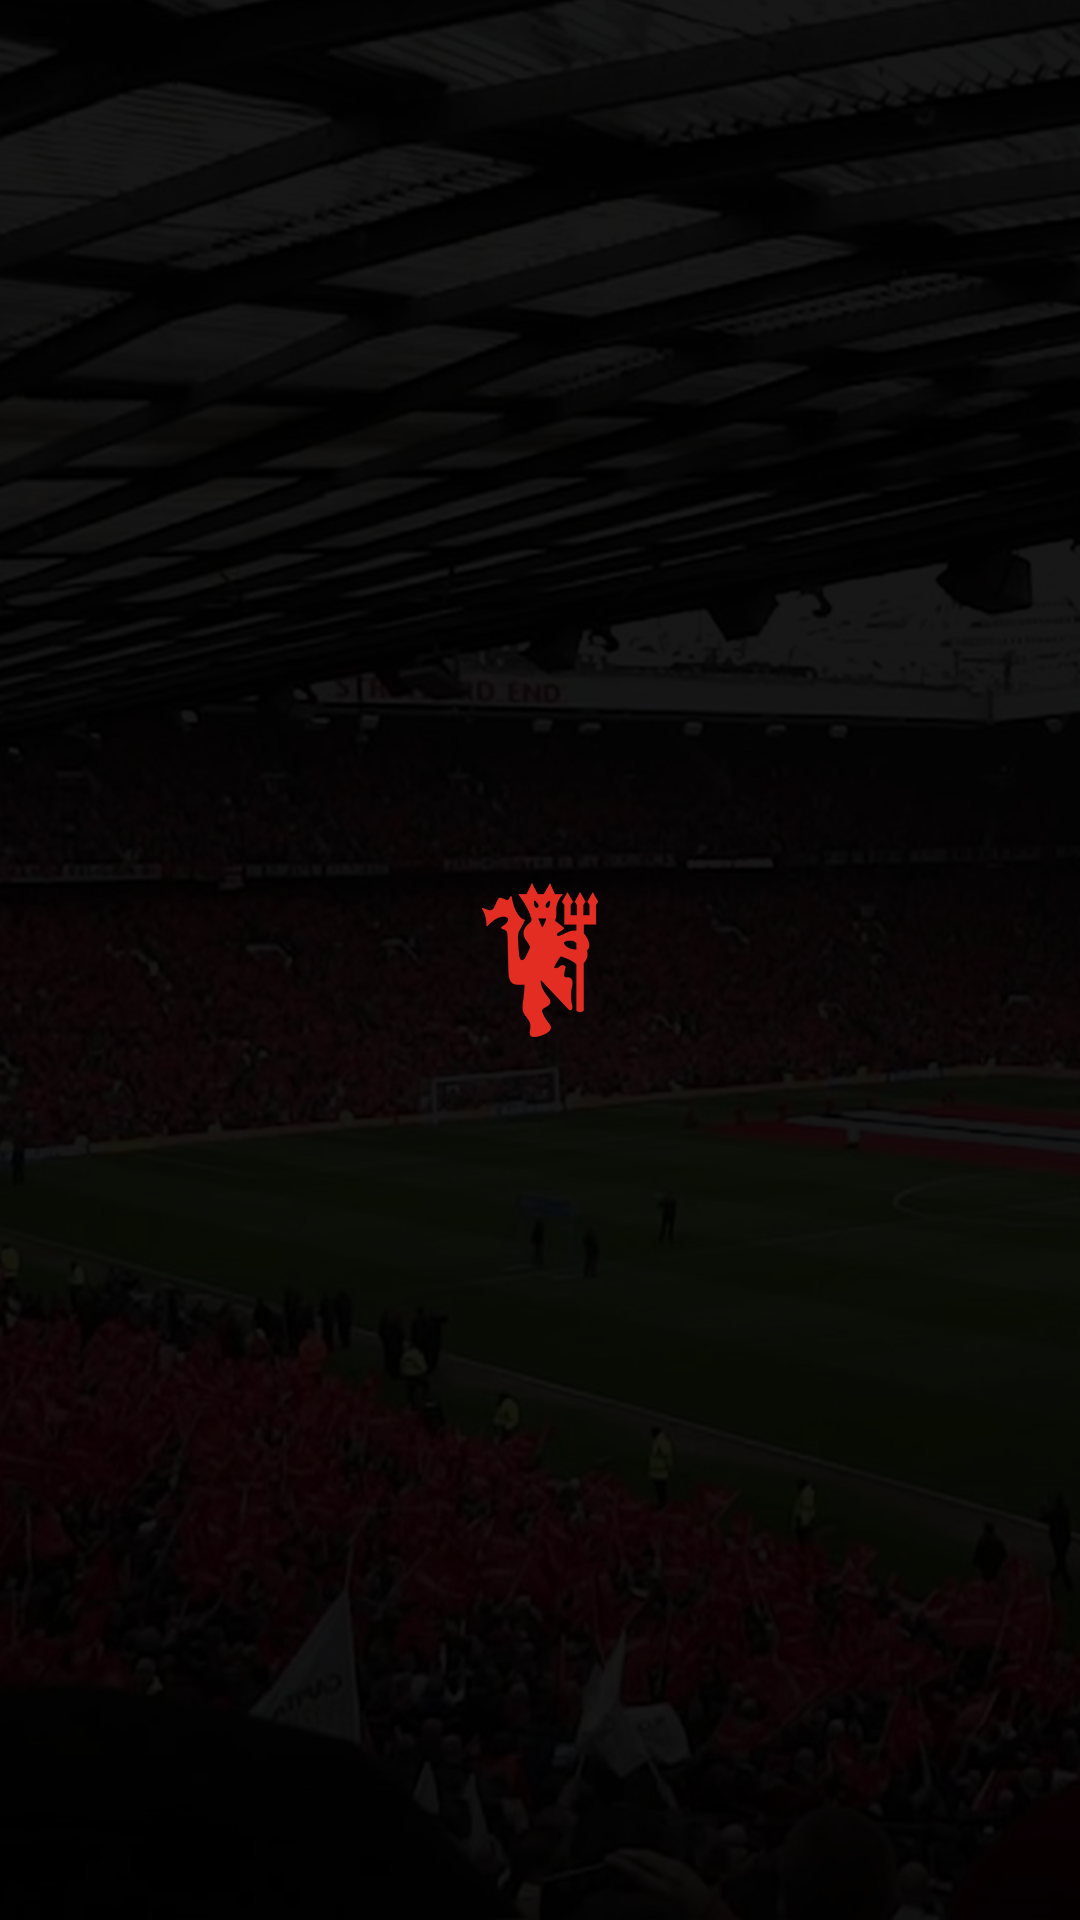 Man Utd Wallpaper For Android 513945 Bola Kaki Kertas Dinding Gambar